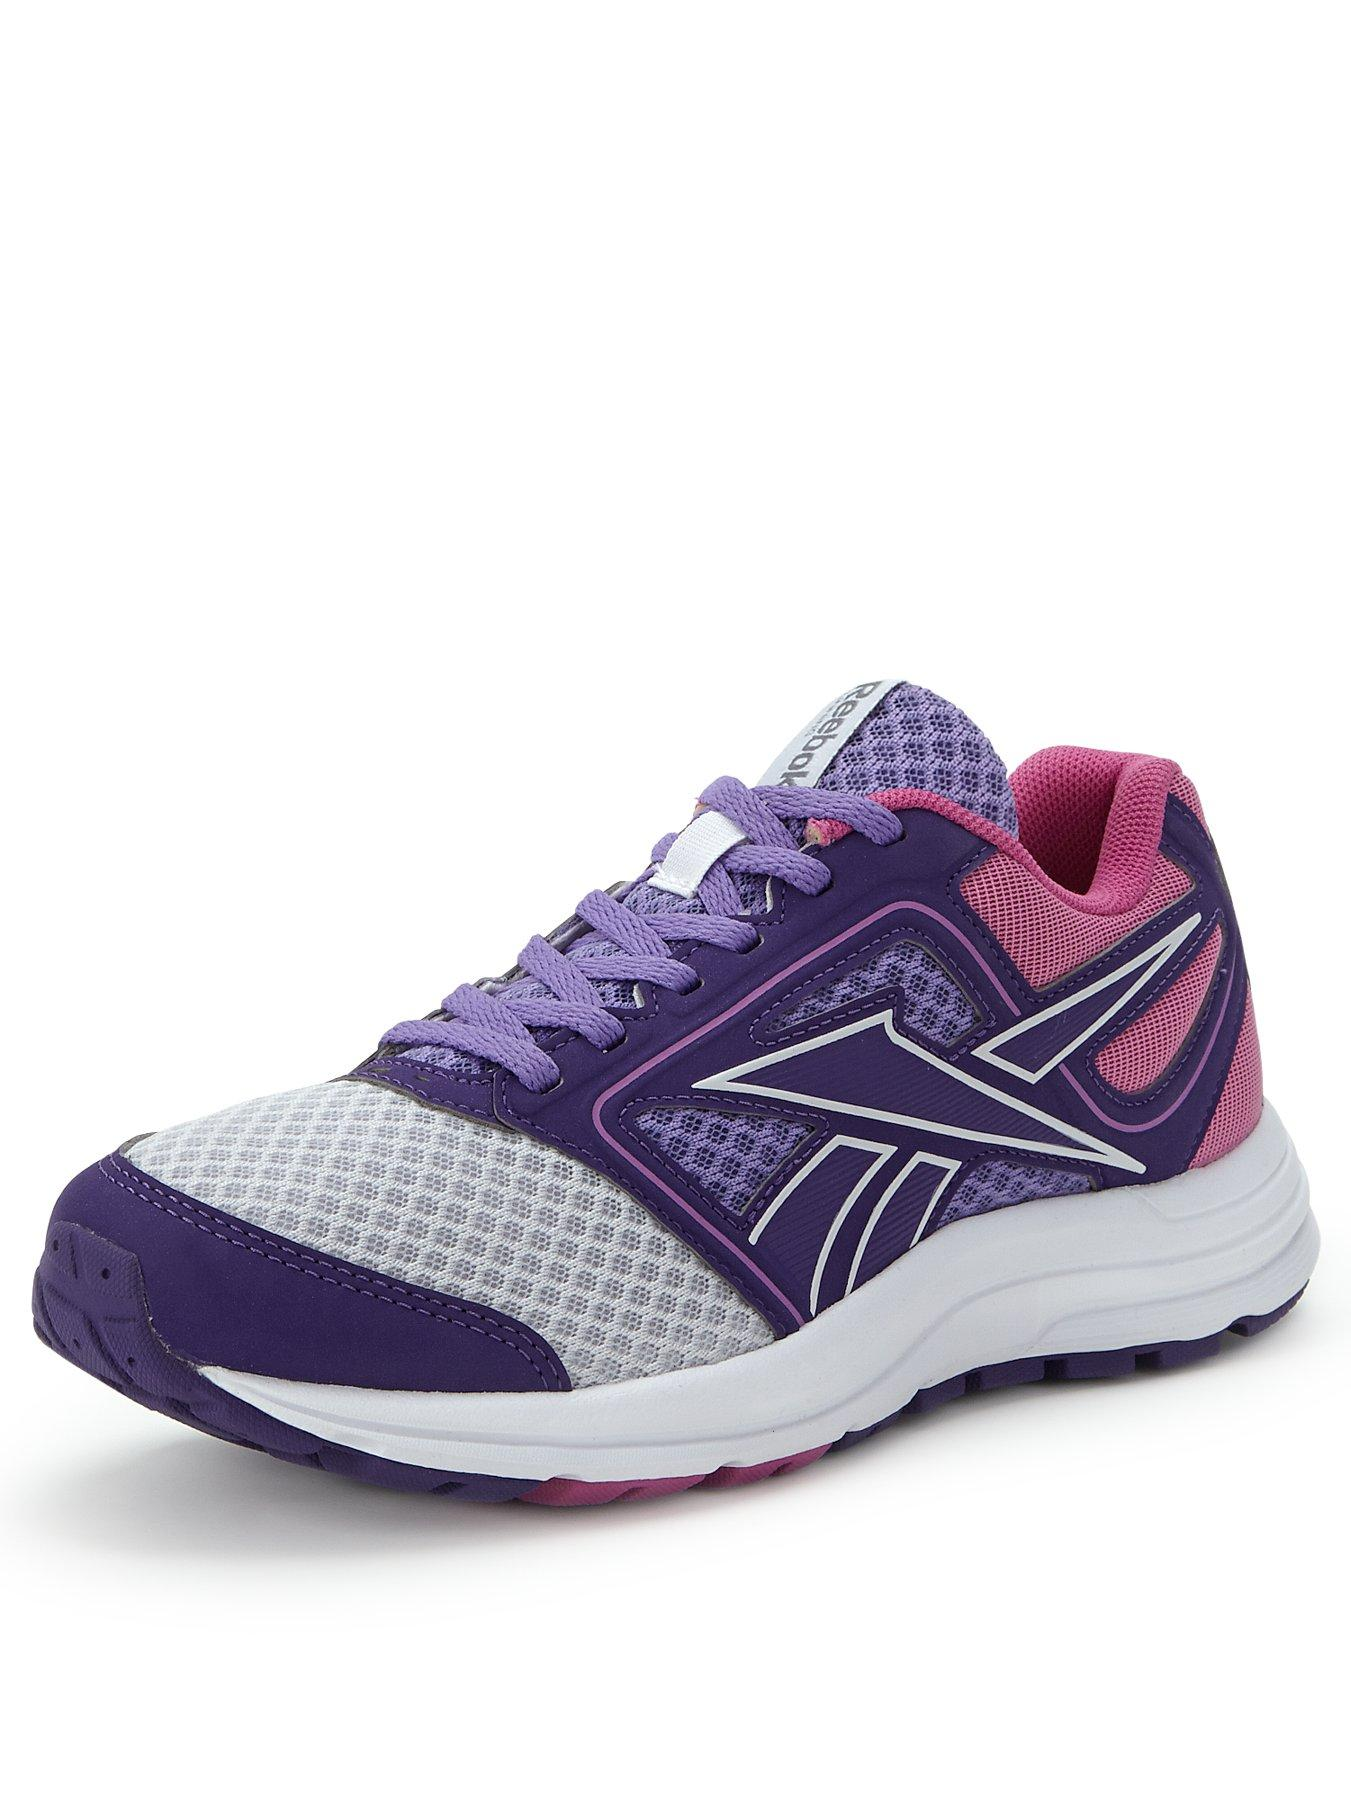 Zone CushRun Trainers Purple